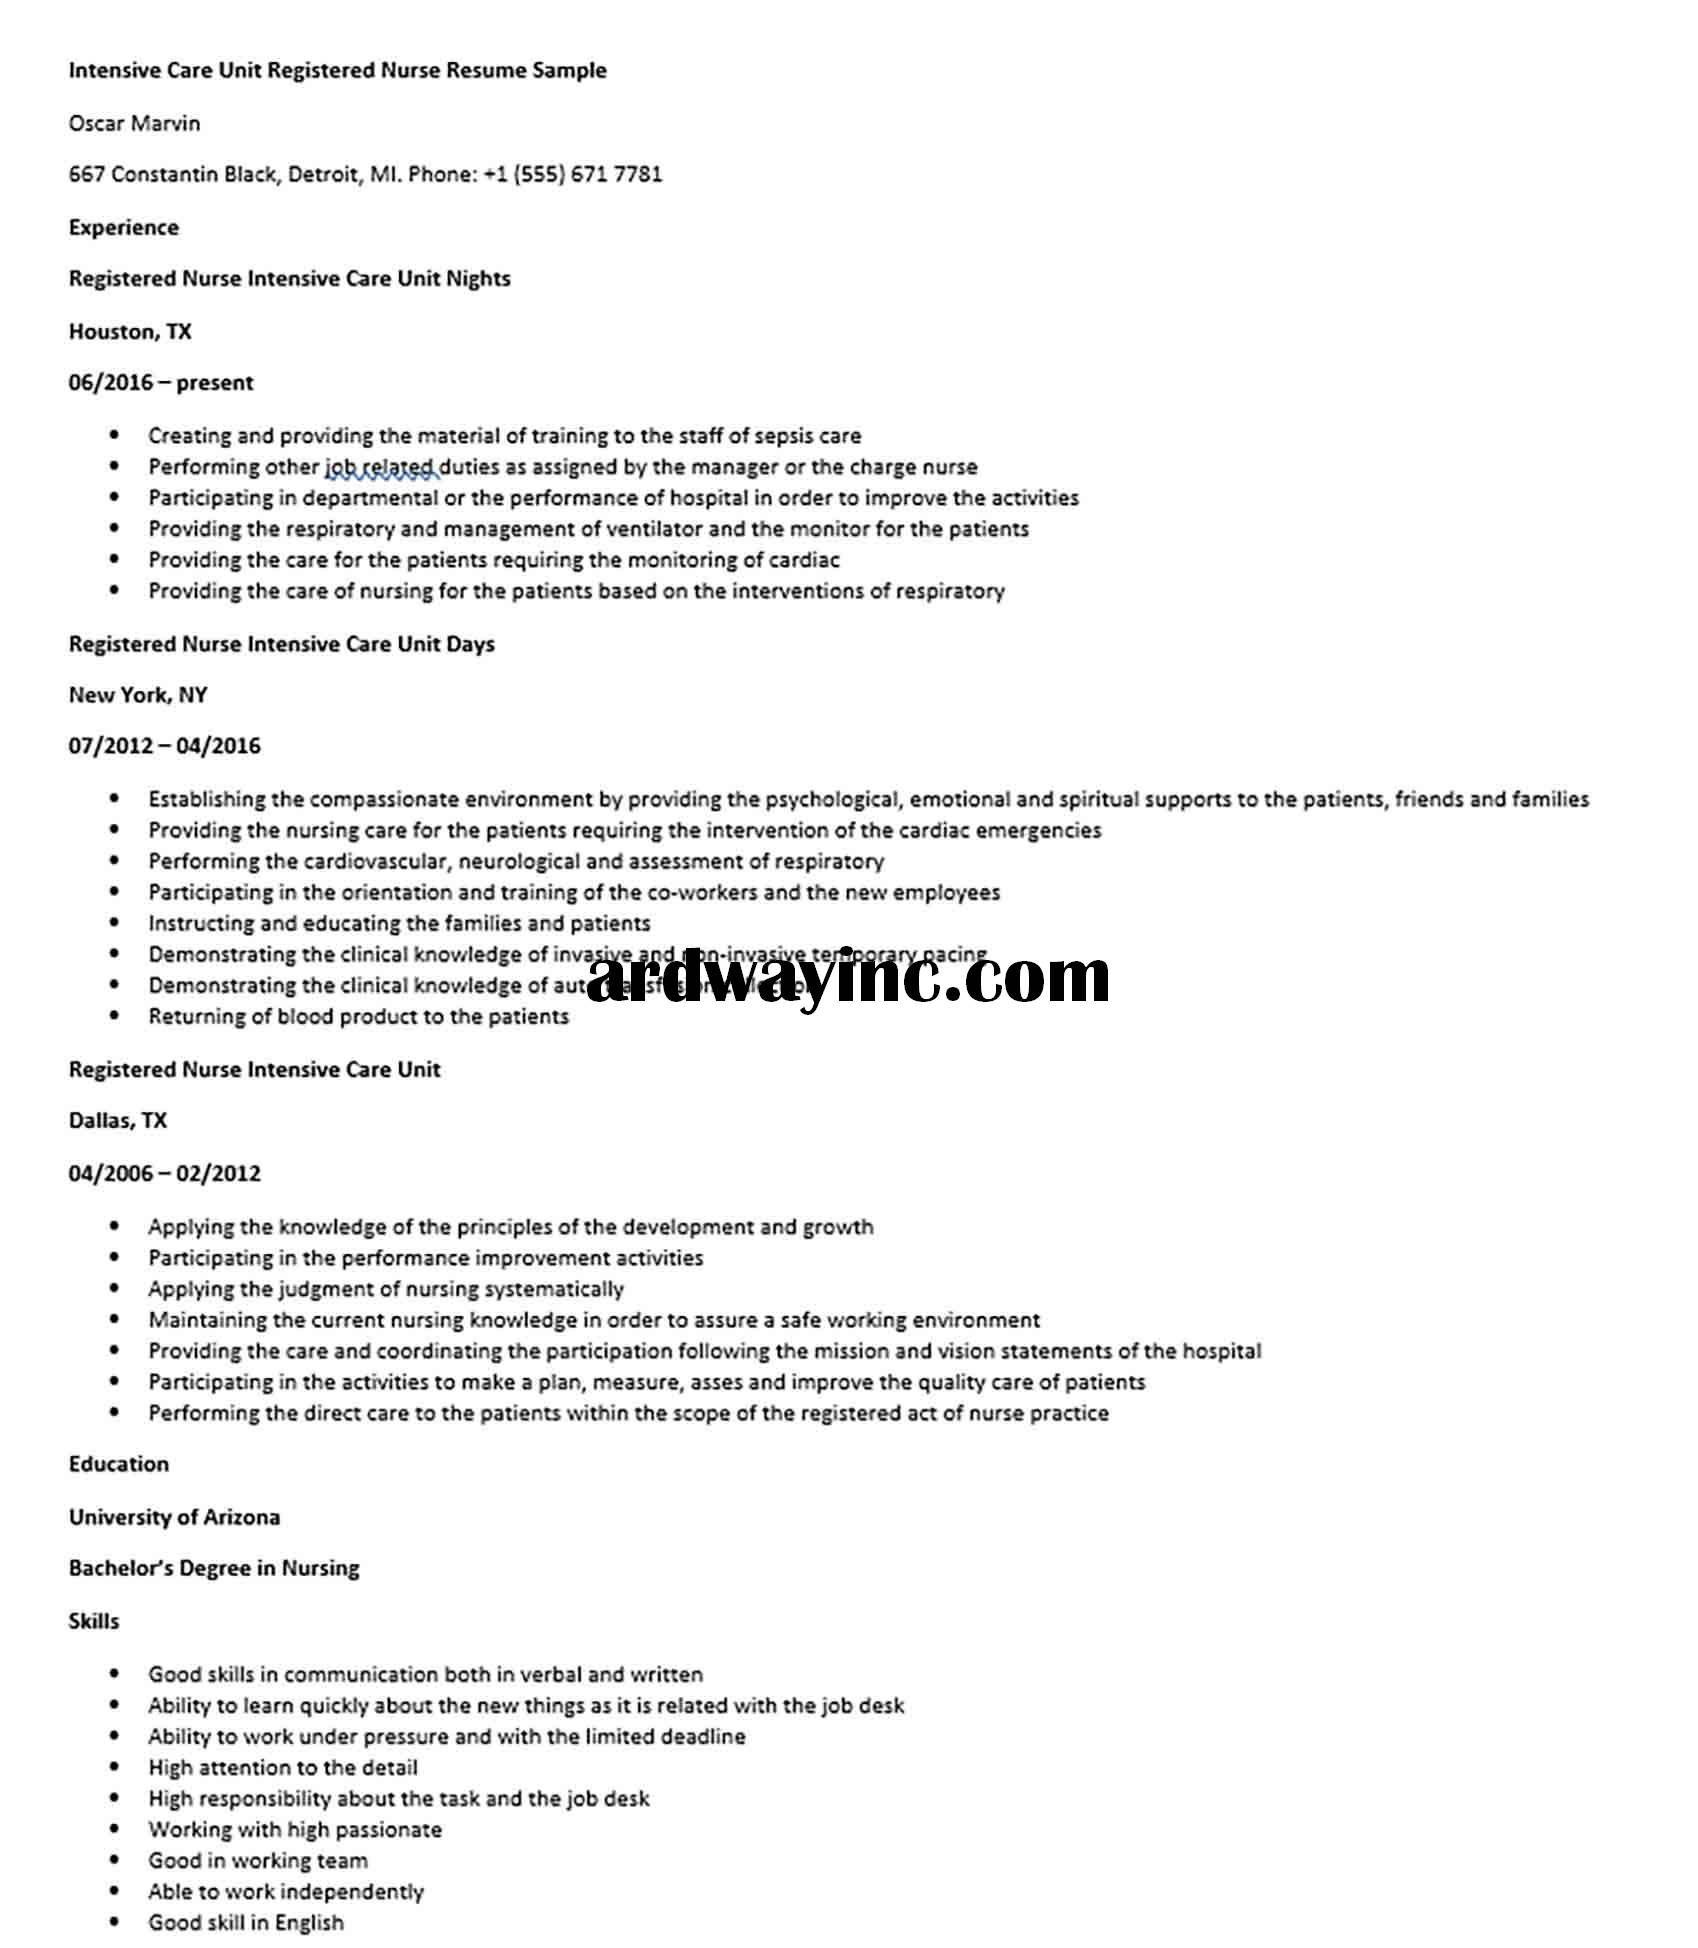 Intensive Care Unit Registered Nurse Resume Sample Registered Nurse Resume Nursing Resume Intensive Care